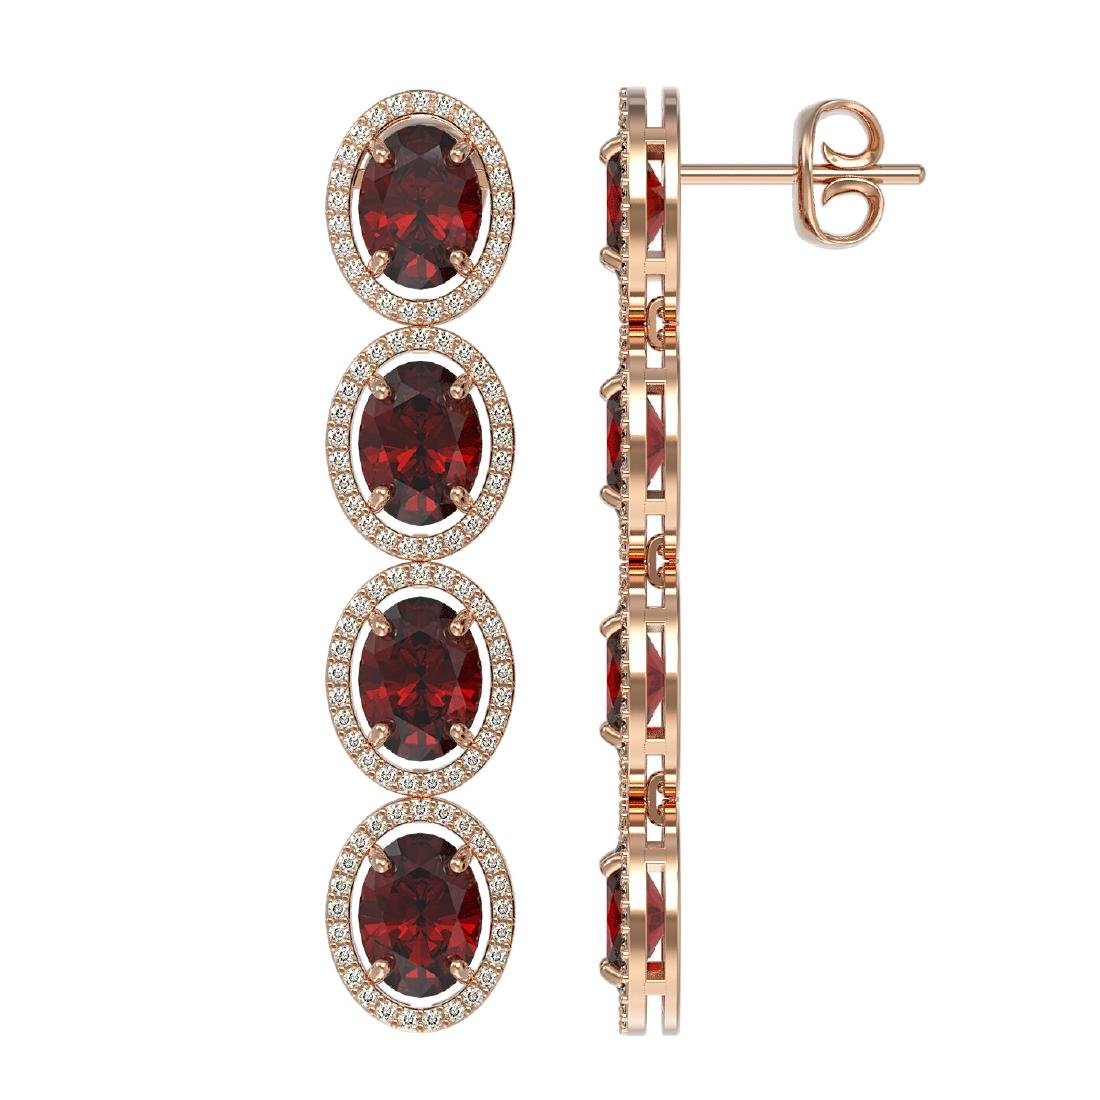 13.64 CTW Garnet & Diamond Halo Earrings 10K Rose Gold - 2